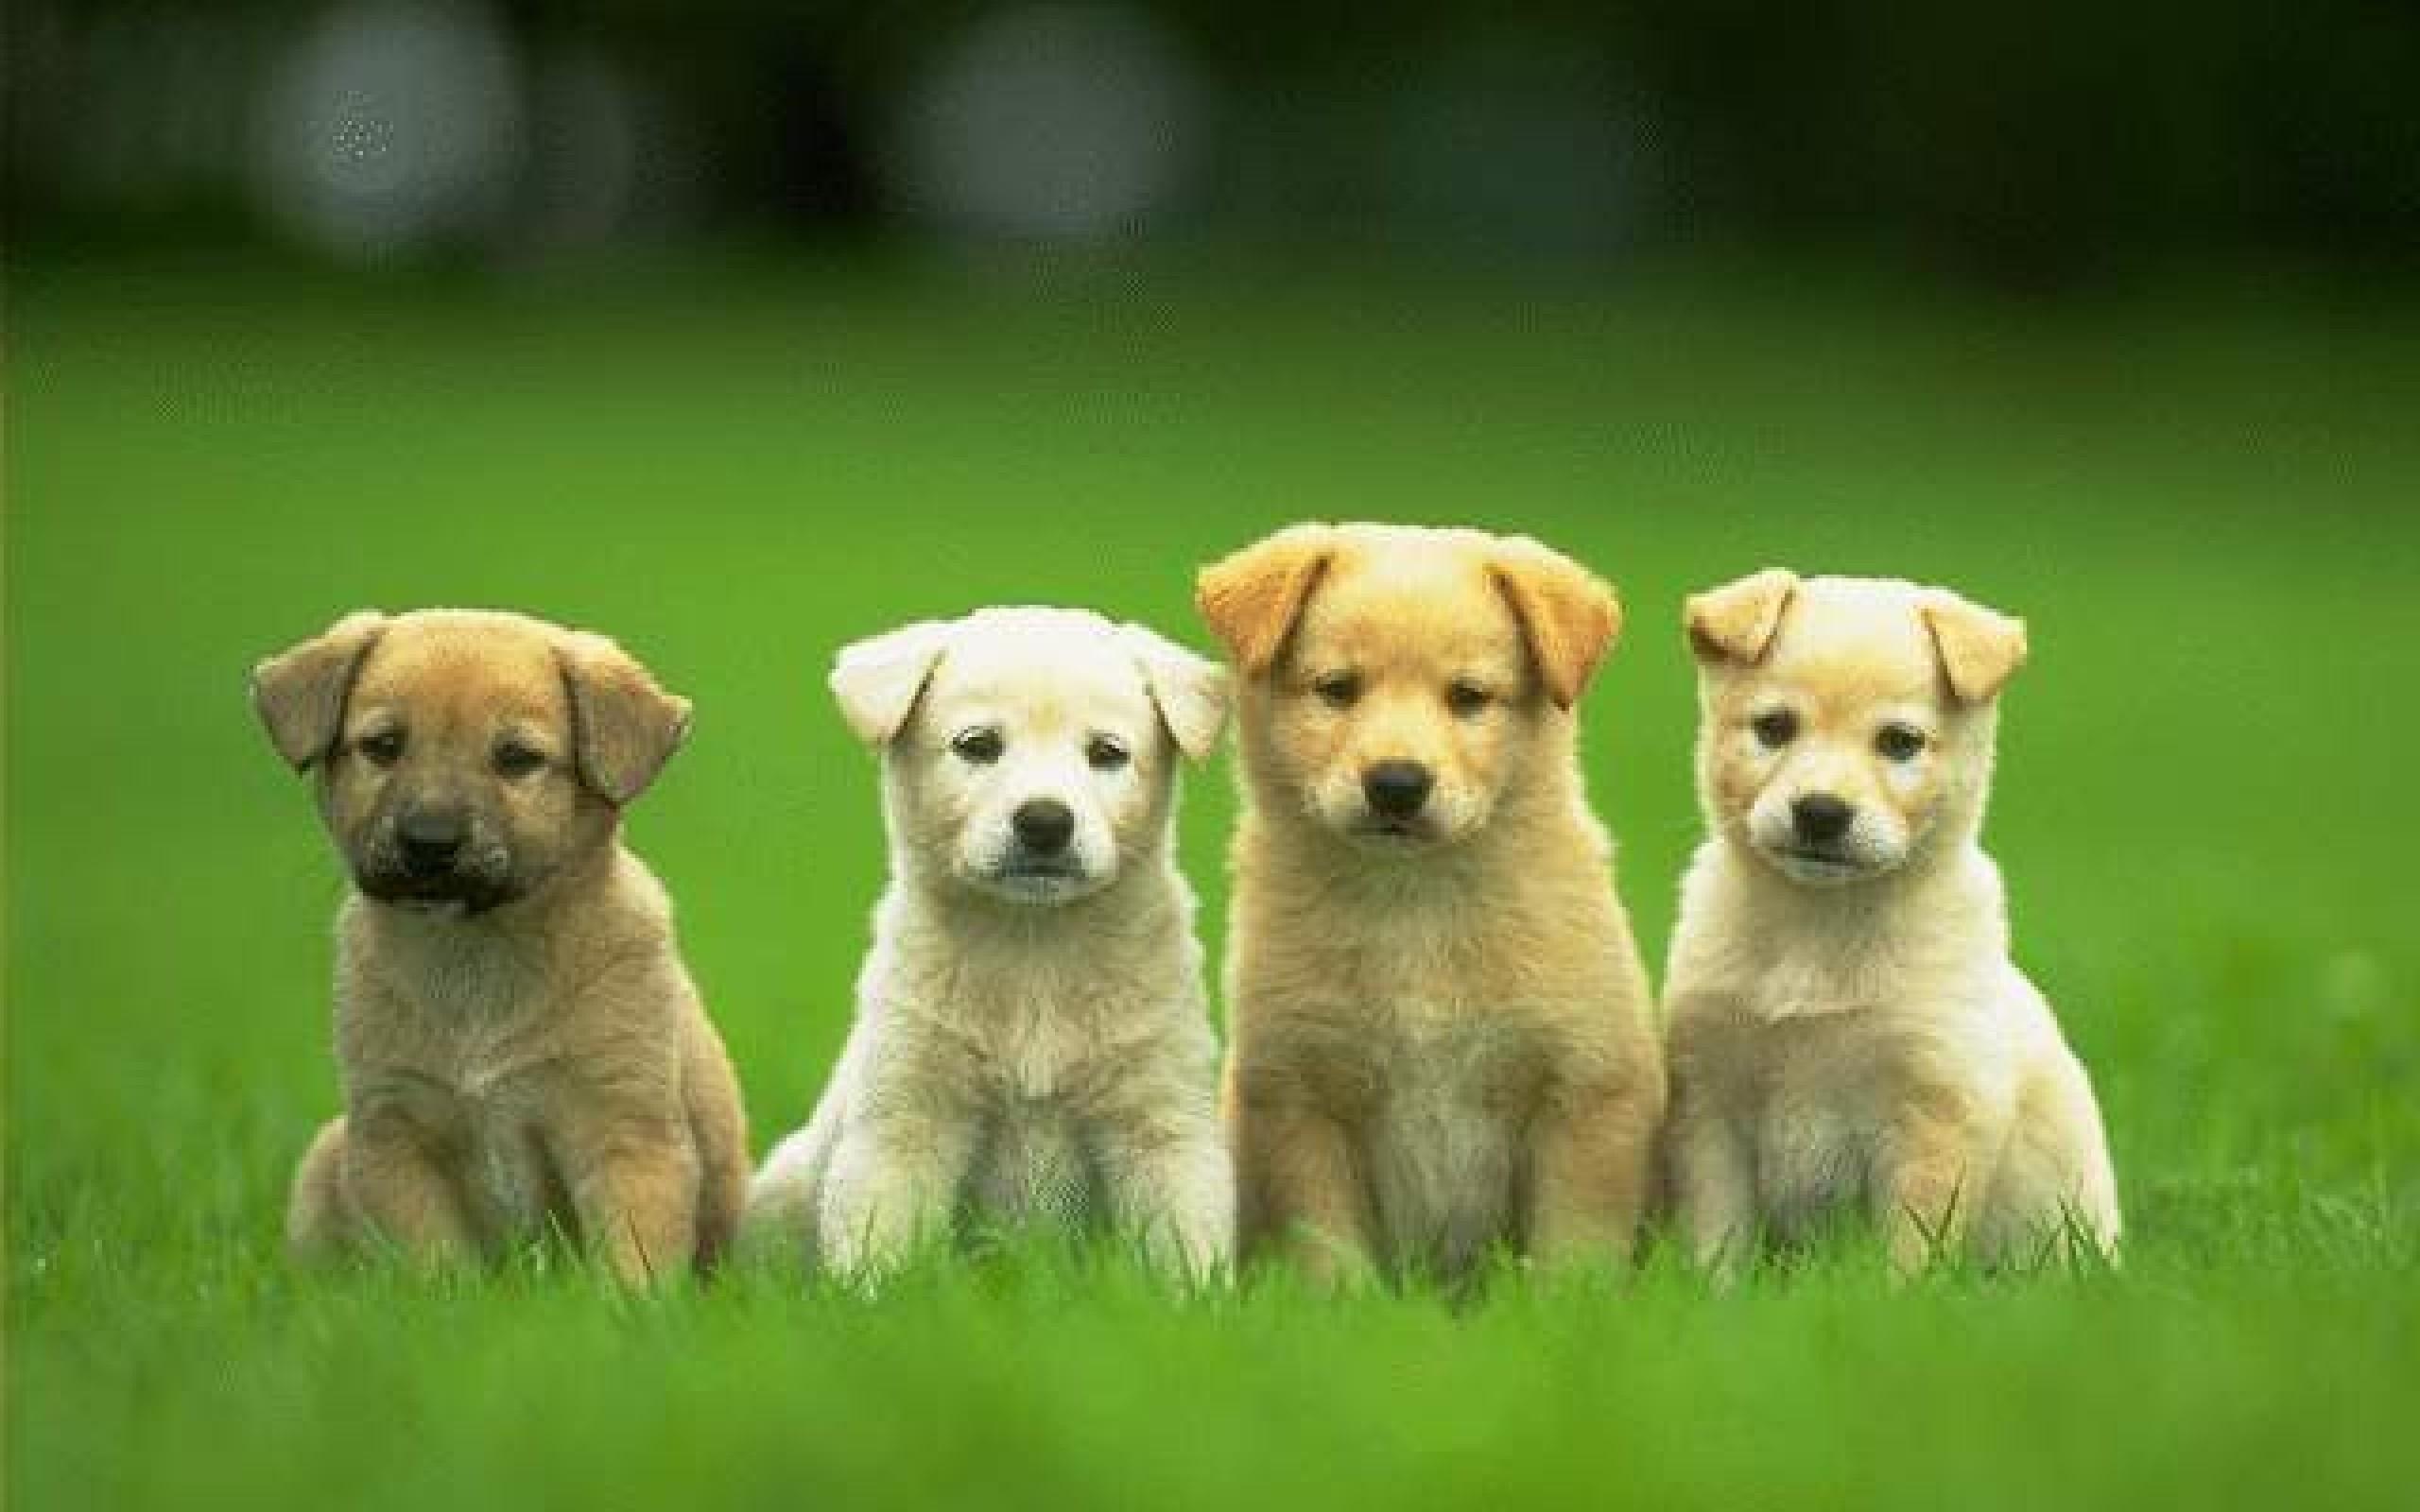 four cute puppy dog wallpaper HD Wallpaper Backgrounds Tumblr 2560x1600